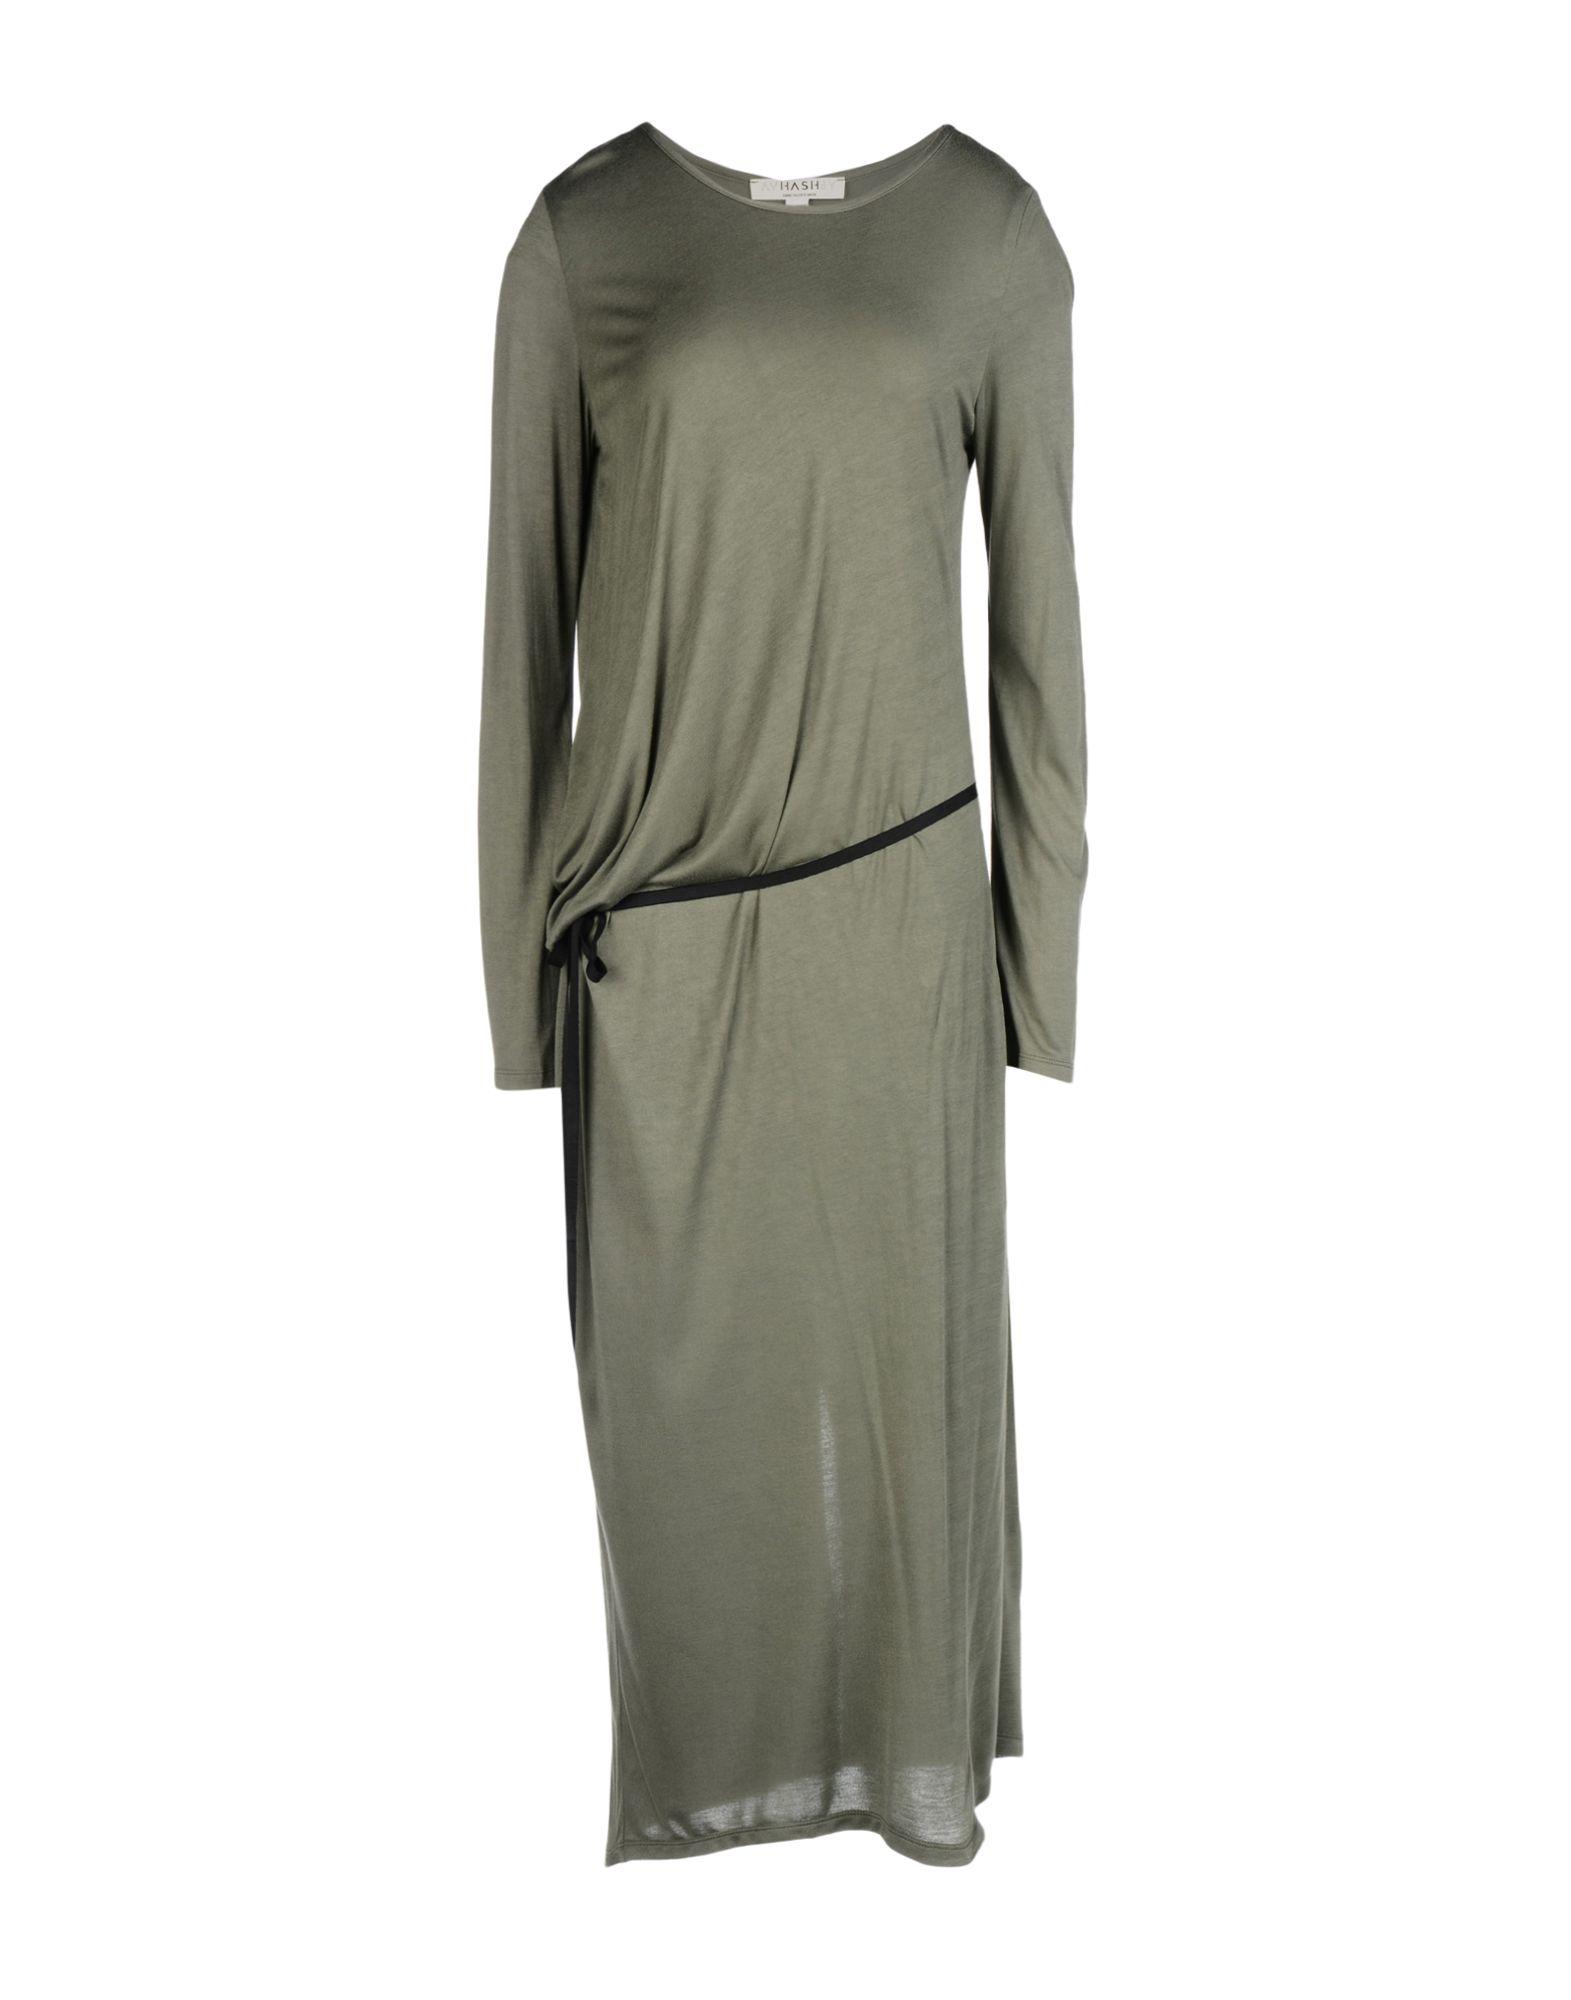 ANNE VALERIE HASH Платье длиной 3/4 lisa corti платье длиной 3 4